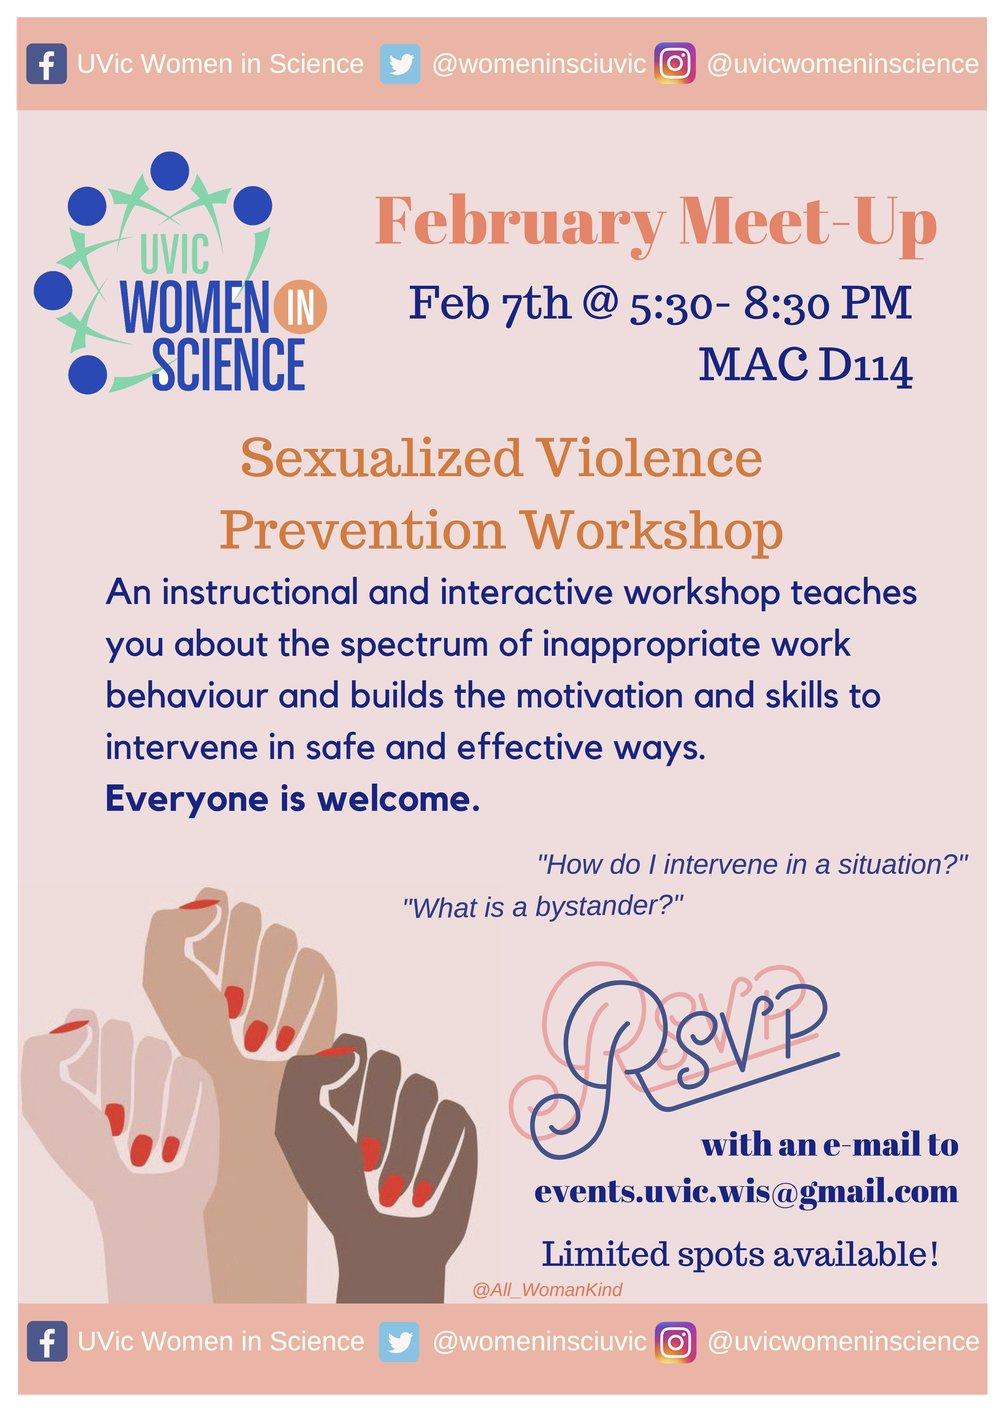 Poster for Feb Meet-Up (2).jpg